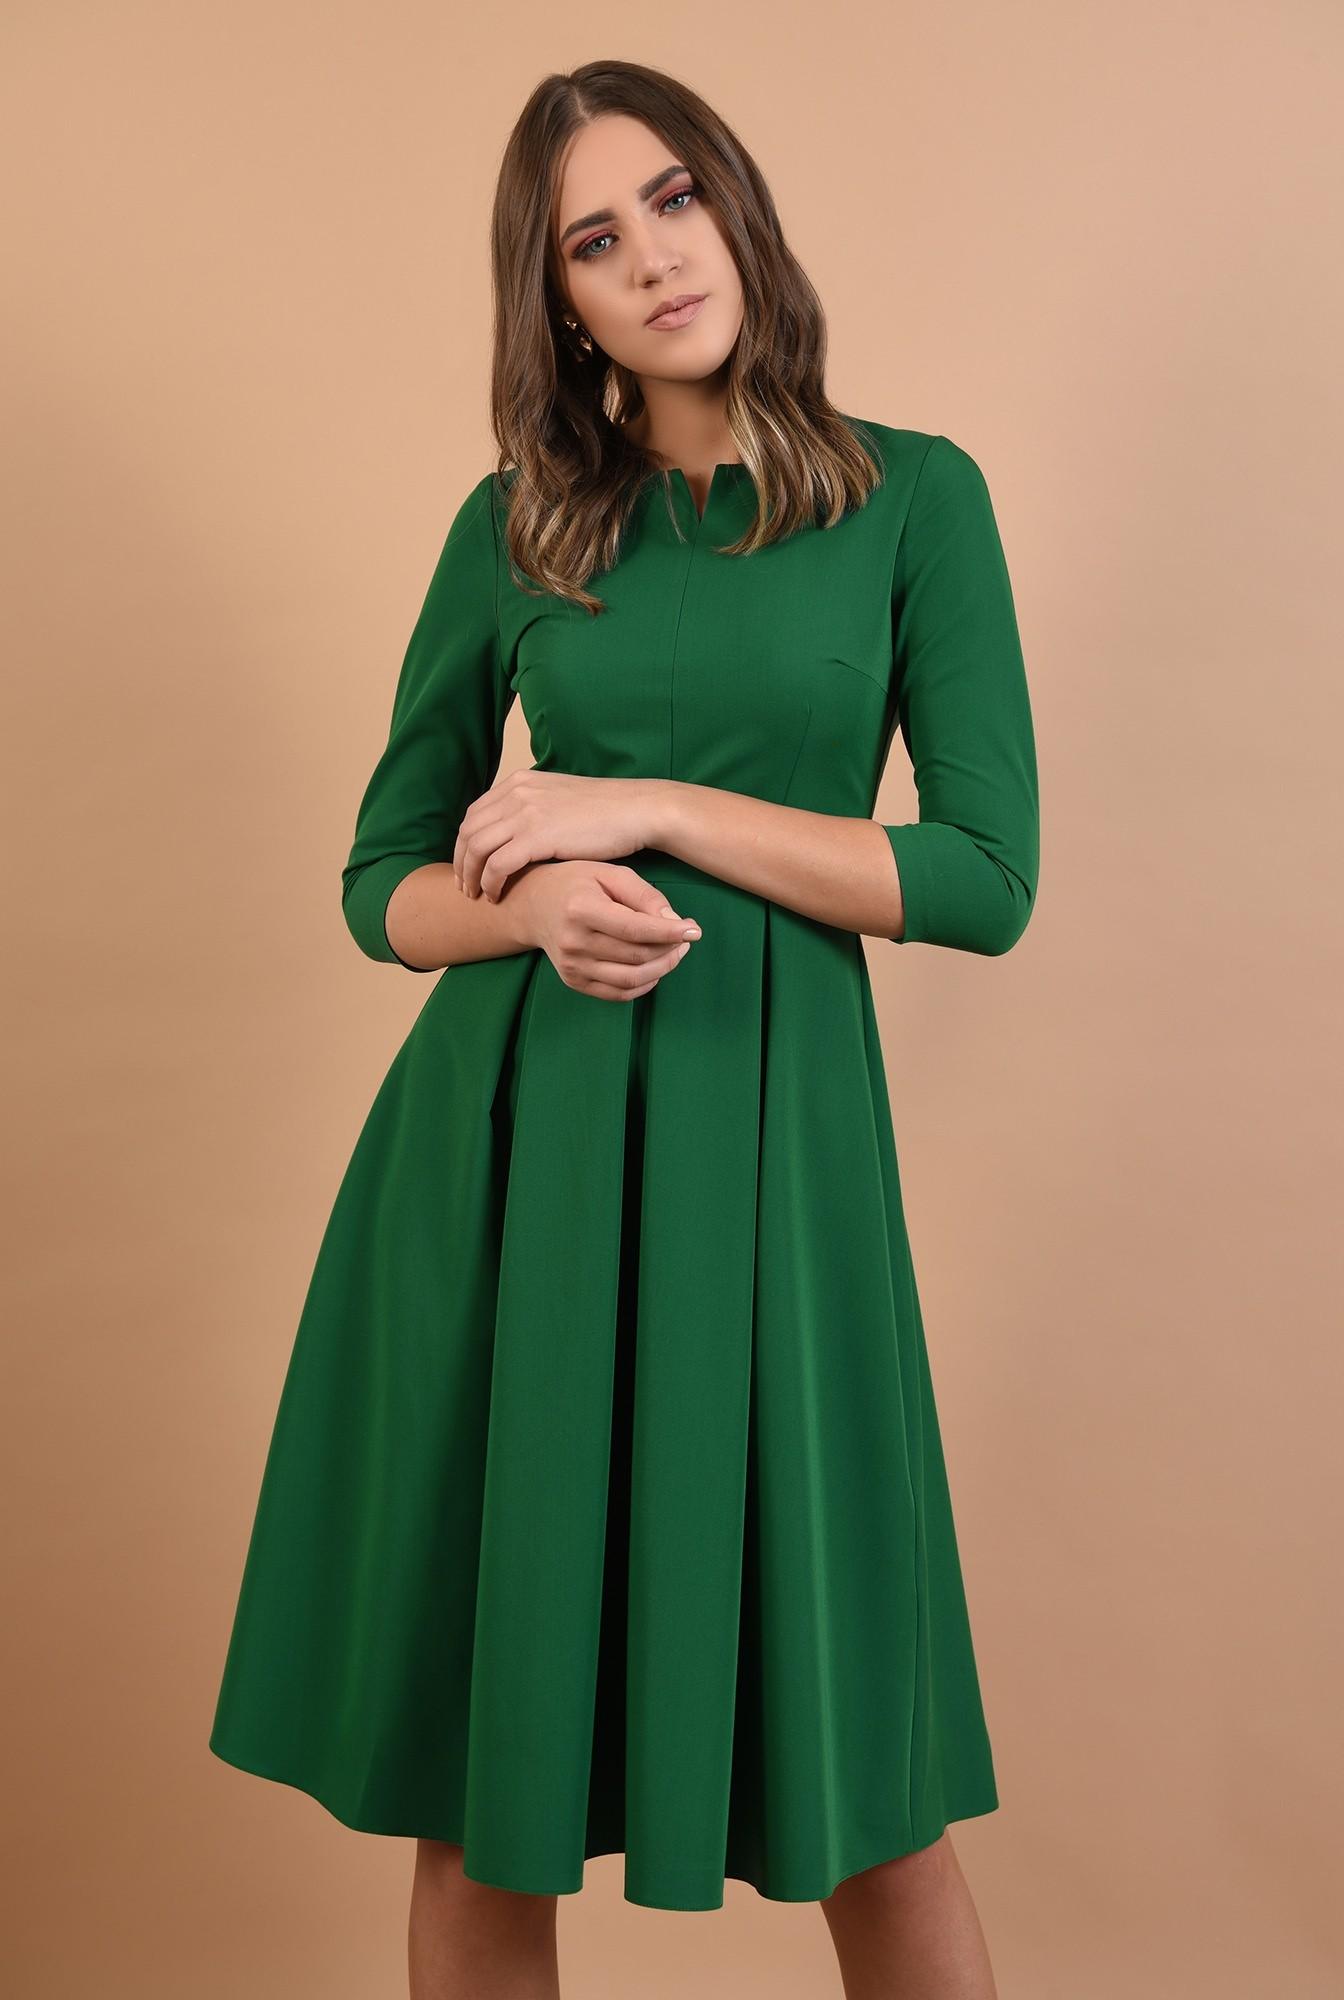 0 - rochie midi, evazata, verde, cu pliseuri, fenta la decolteu, Poema